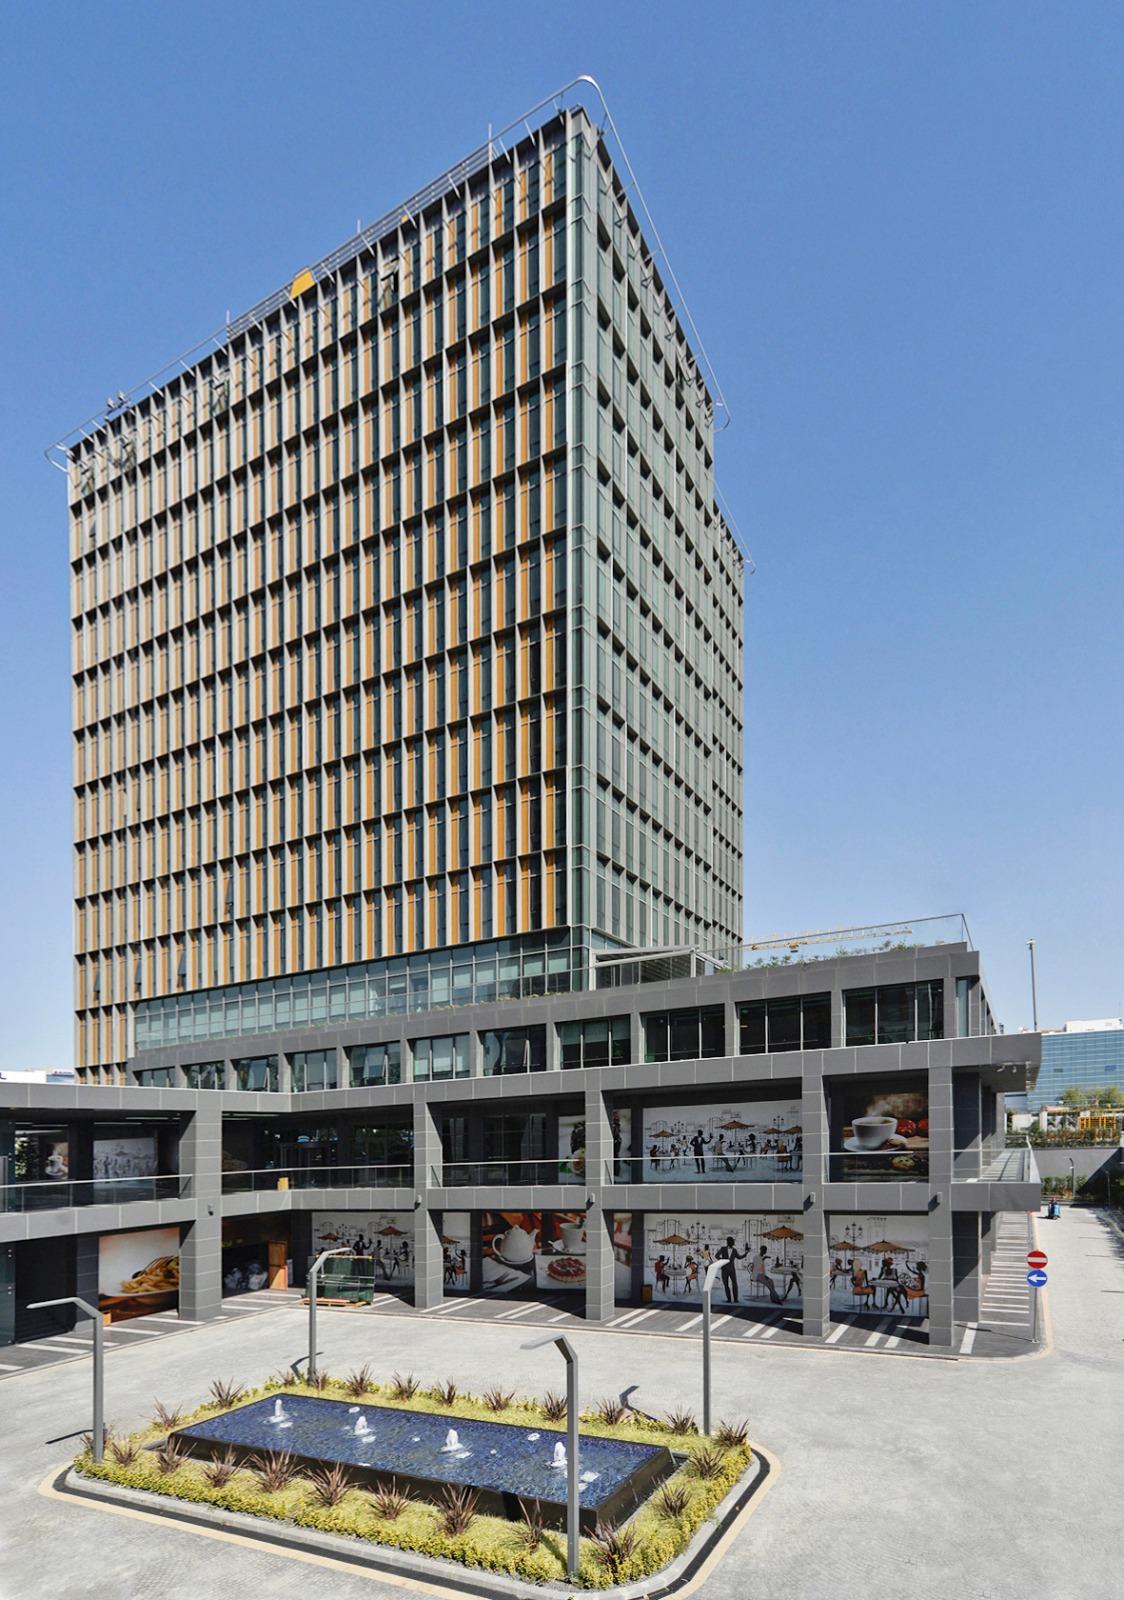 Бизнес-центр с жилыми апартаментами в Атакёе - Фото 21